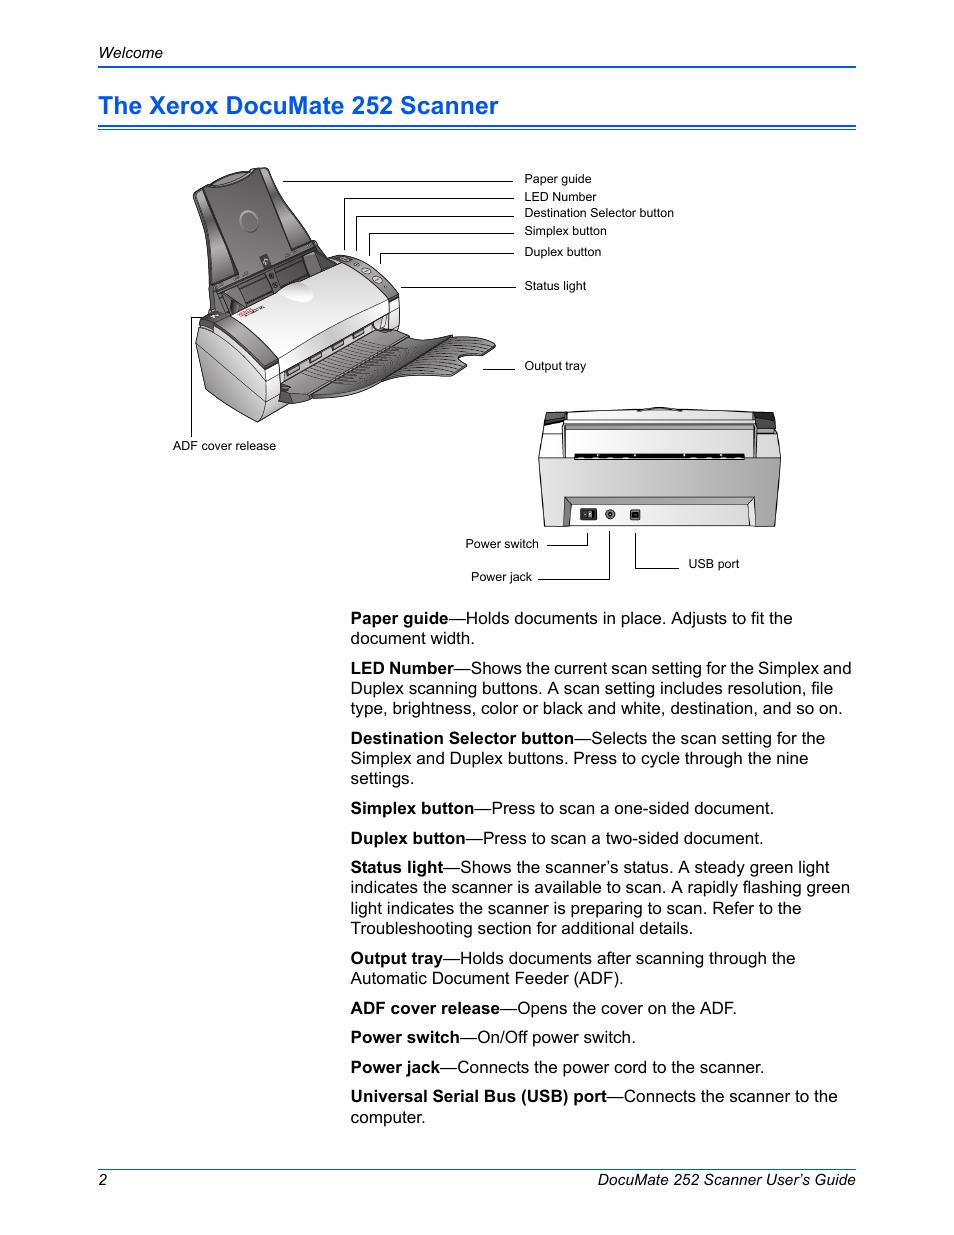 the xerox documate 252 scanner xerox documate 252 user manual rh manualsdir com xerox documate 262 service manual DocuMate 252 Windows 8